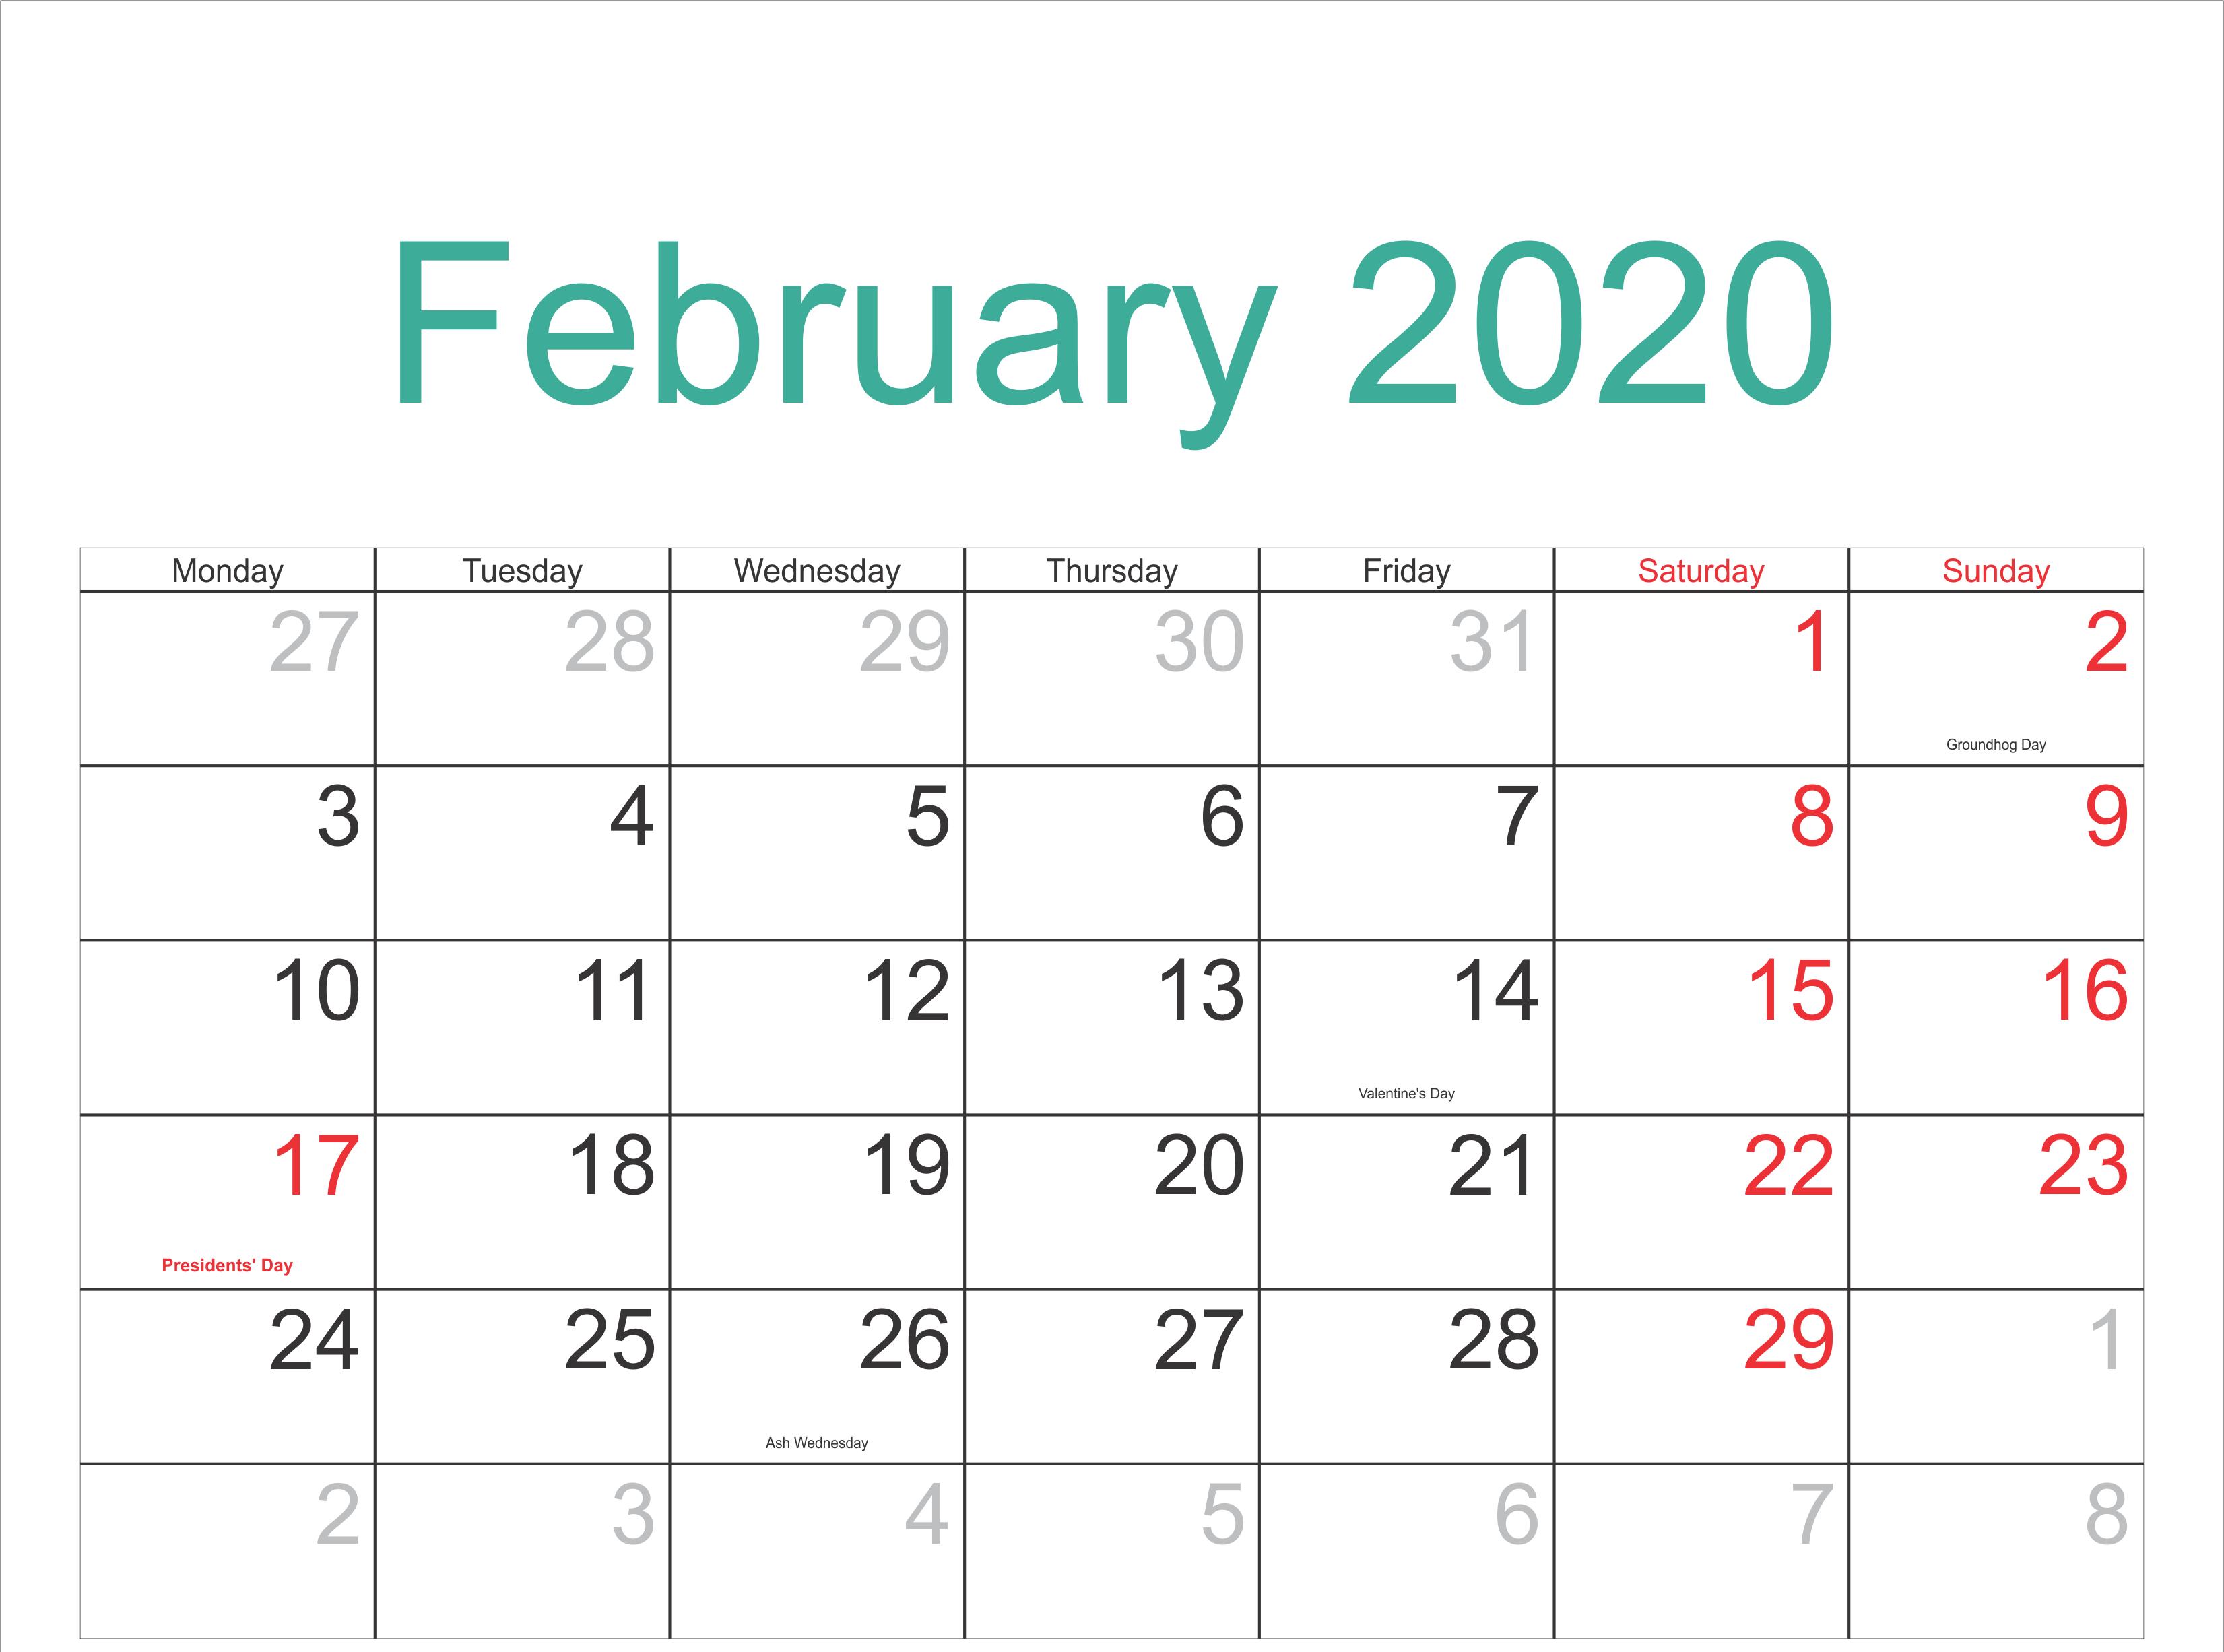 February 2020 Calendar Printable Holidays Full